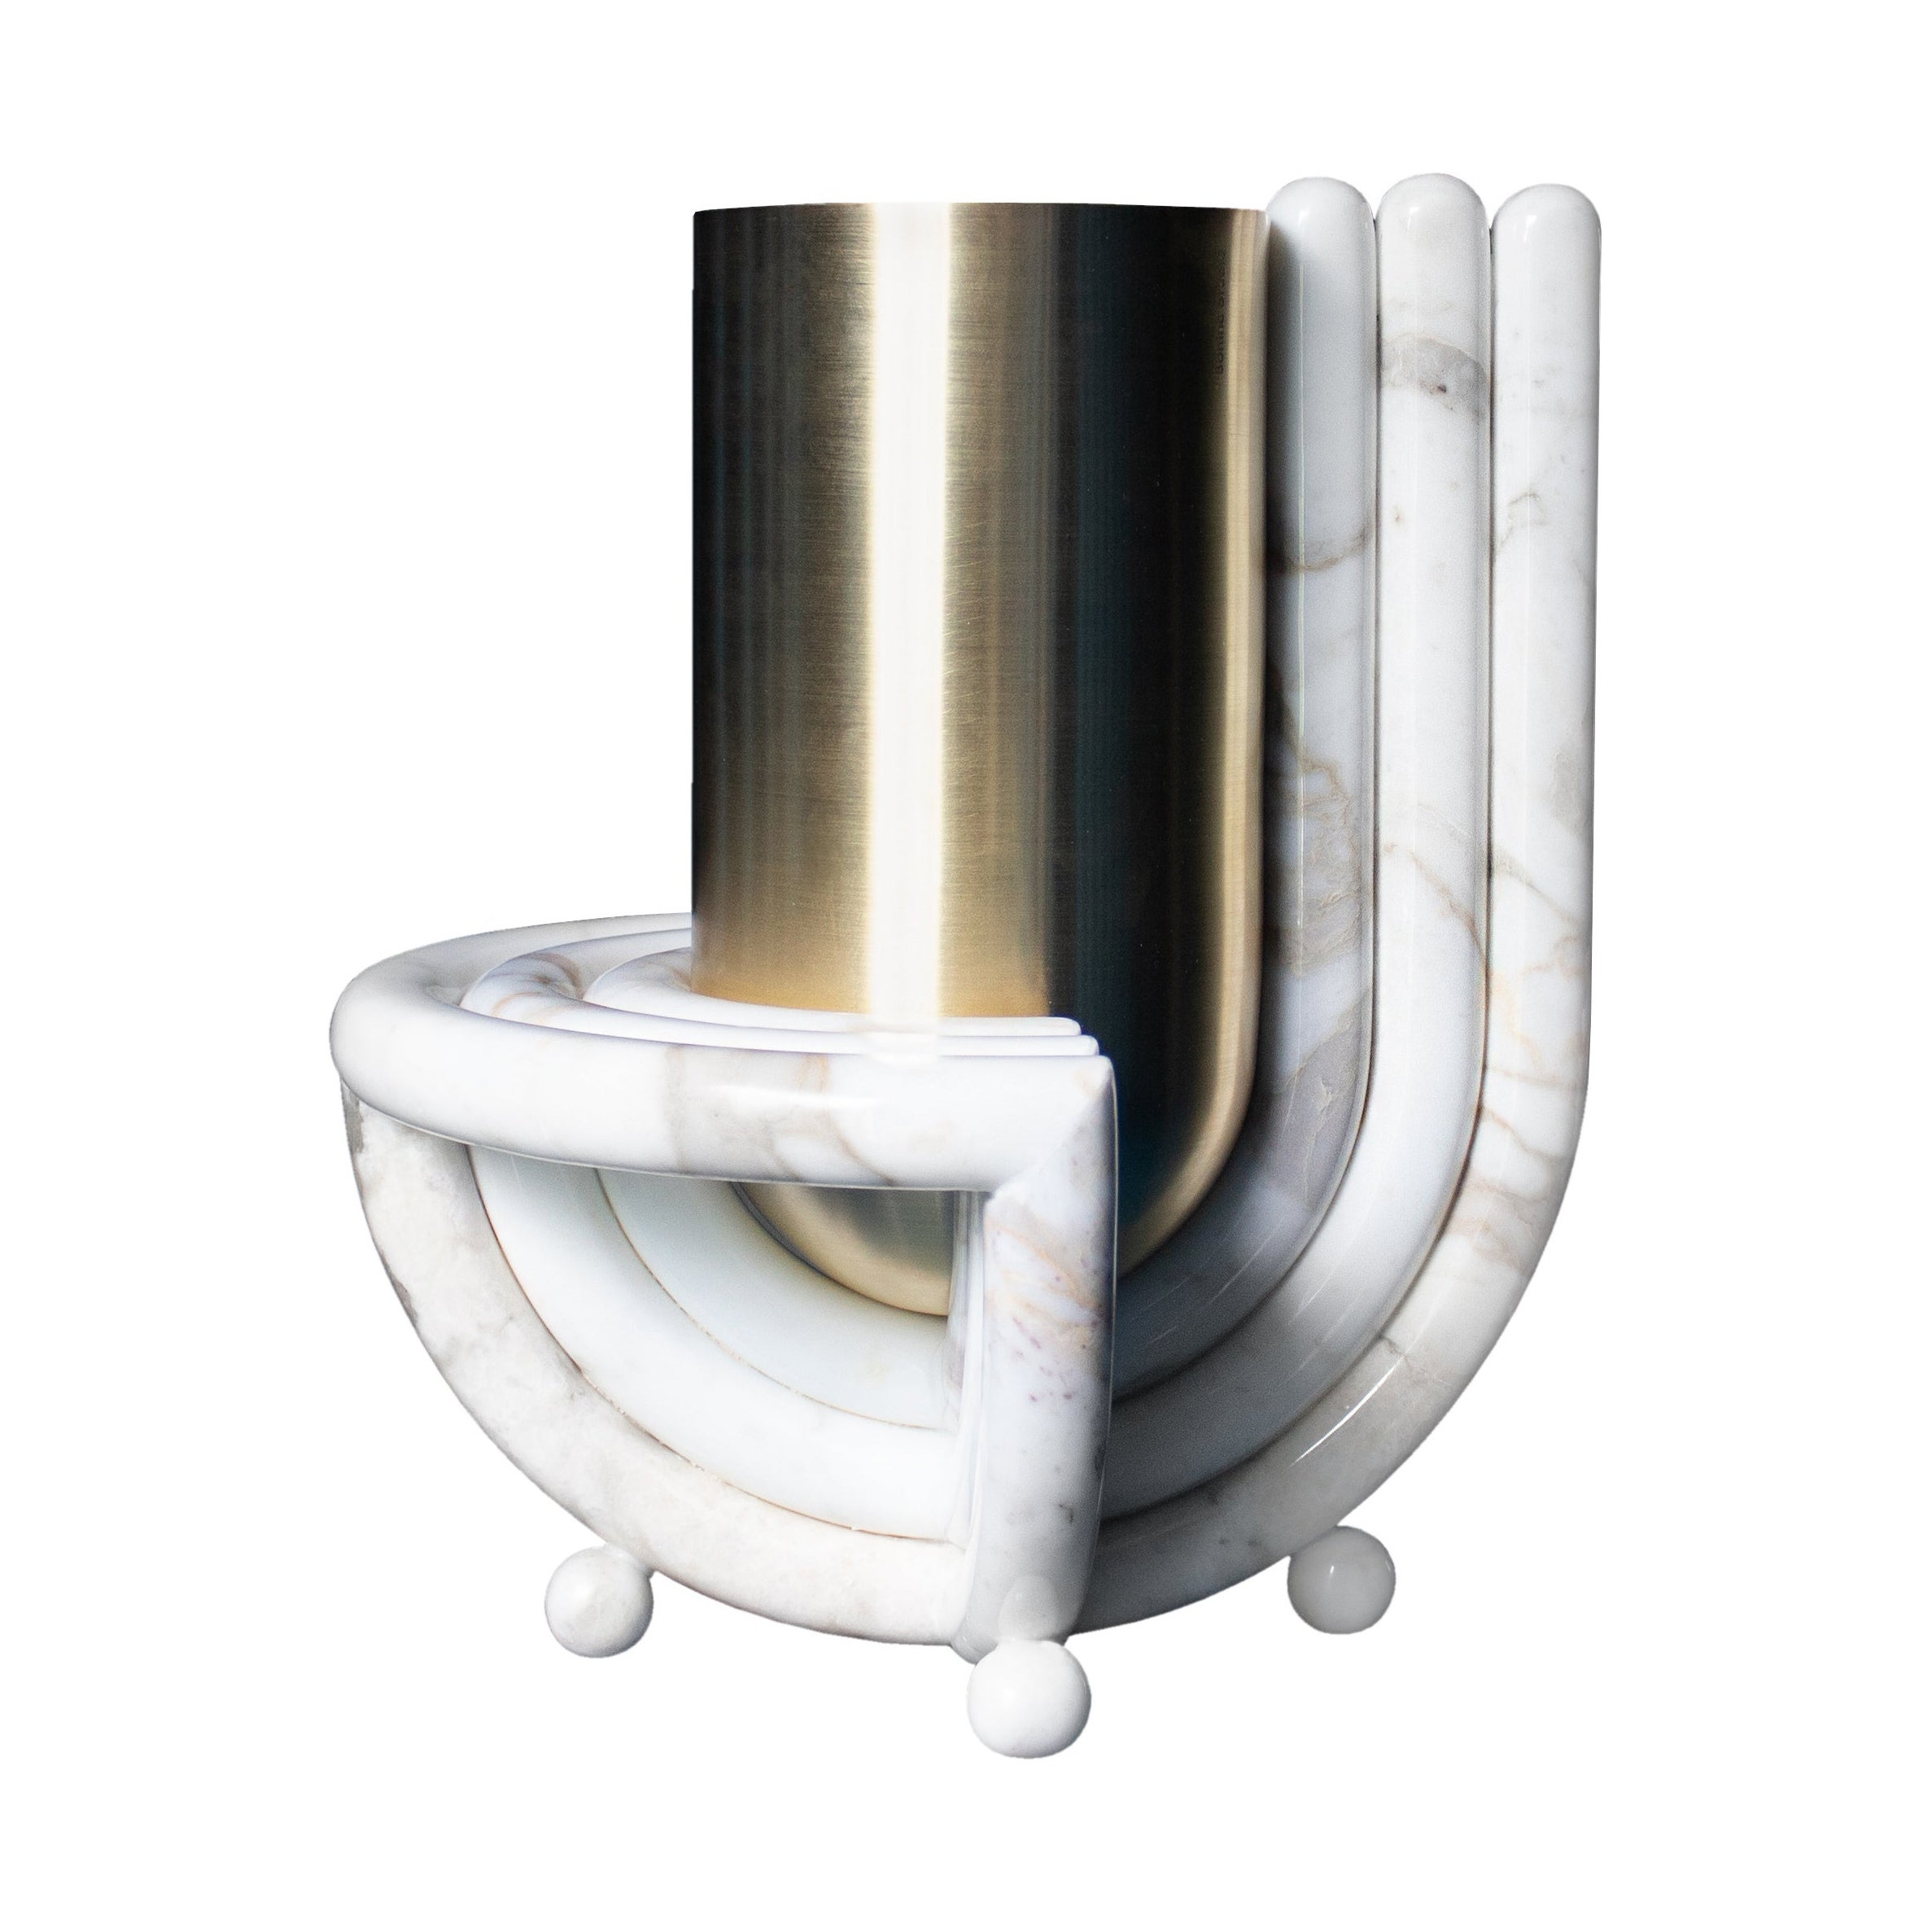 Jupiter Vase, Marble and Brass, by Bohinc Studio